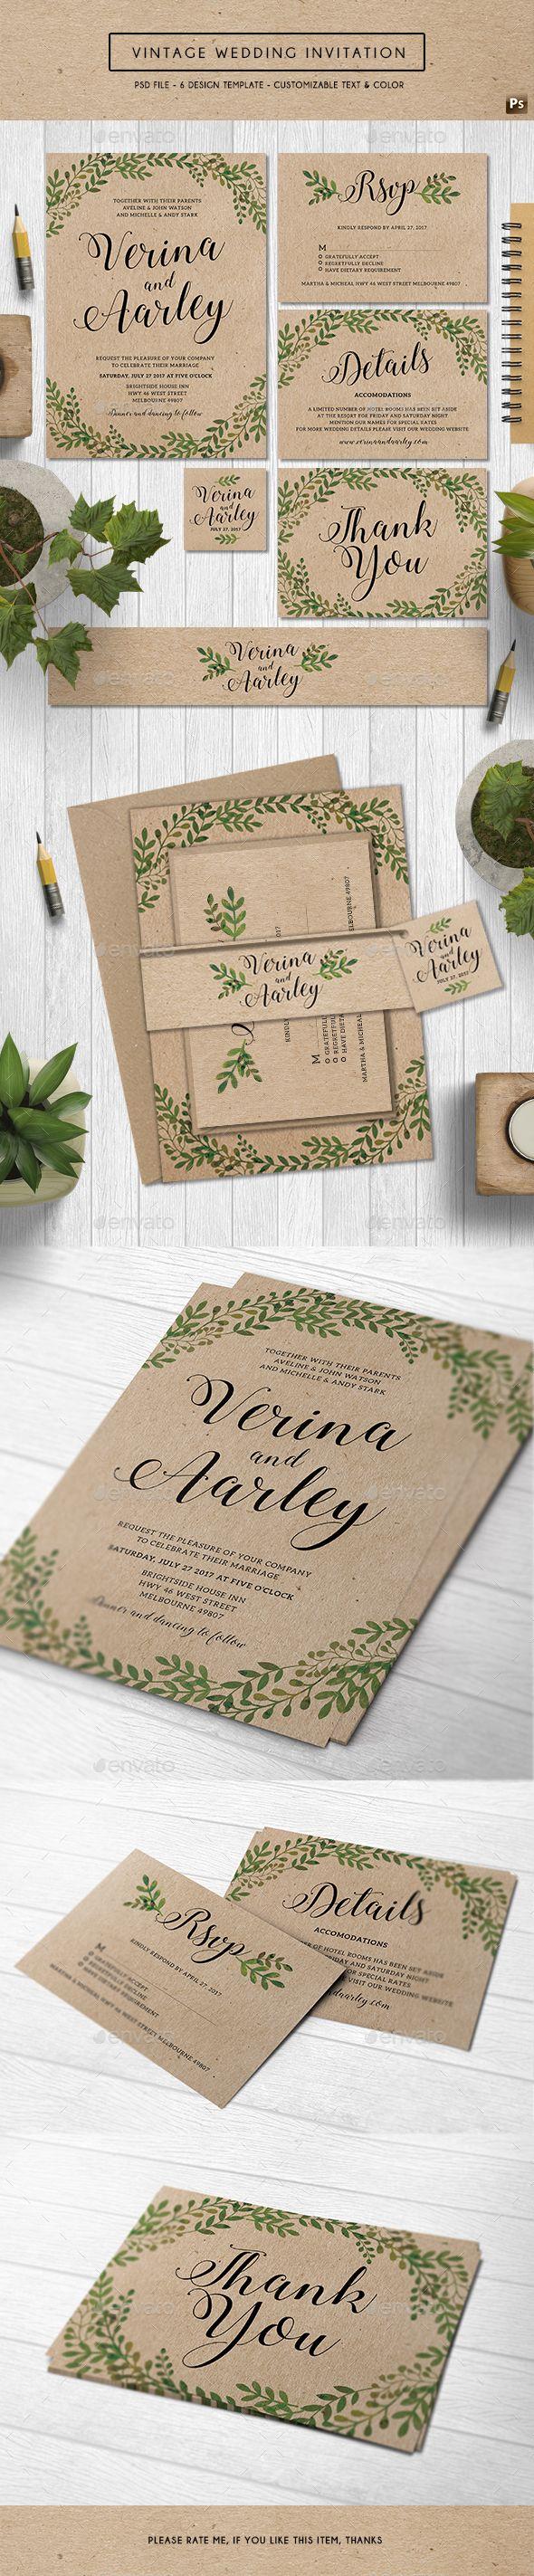 wedding invitations design template%0A Wedding Invitation Set  Wedding Invitation TemplatesWedding